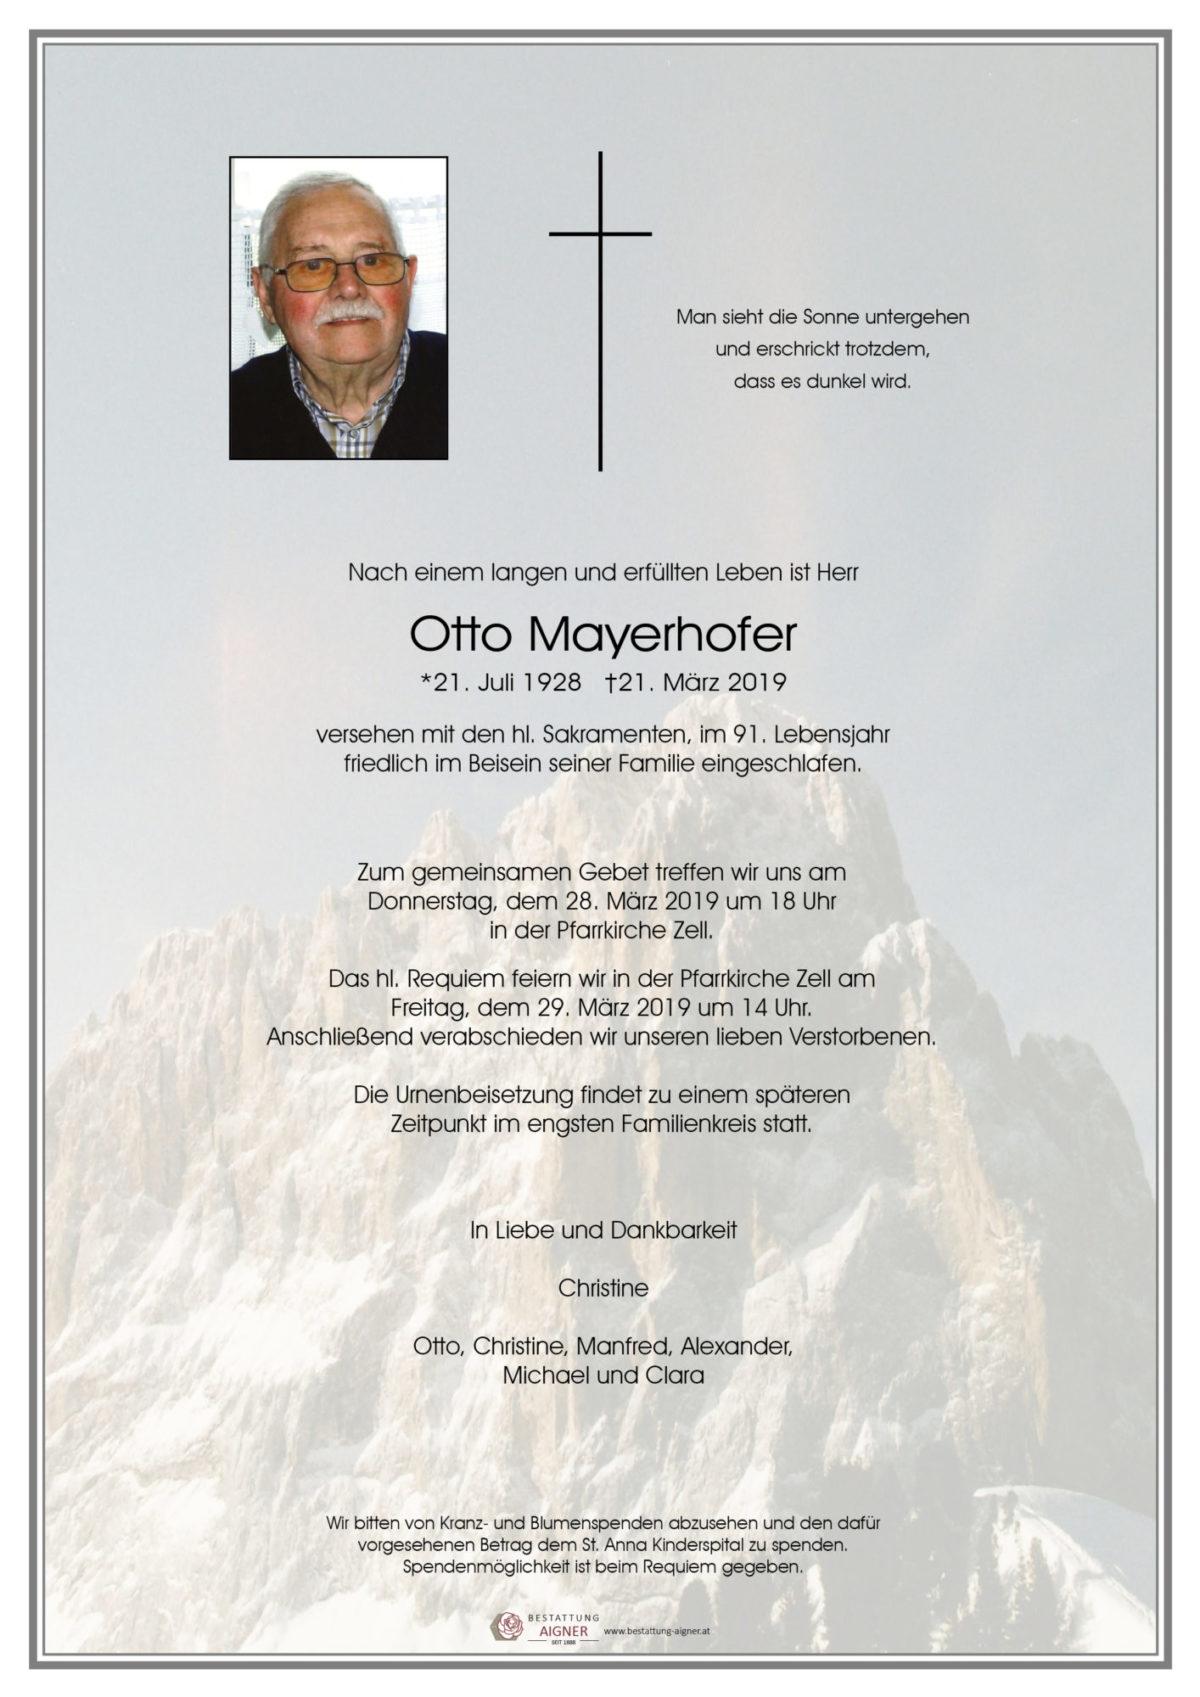 Otto Mayerhofer